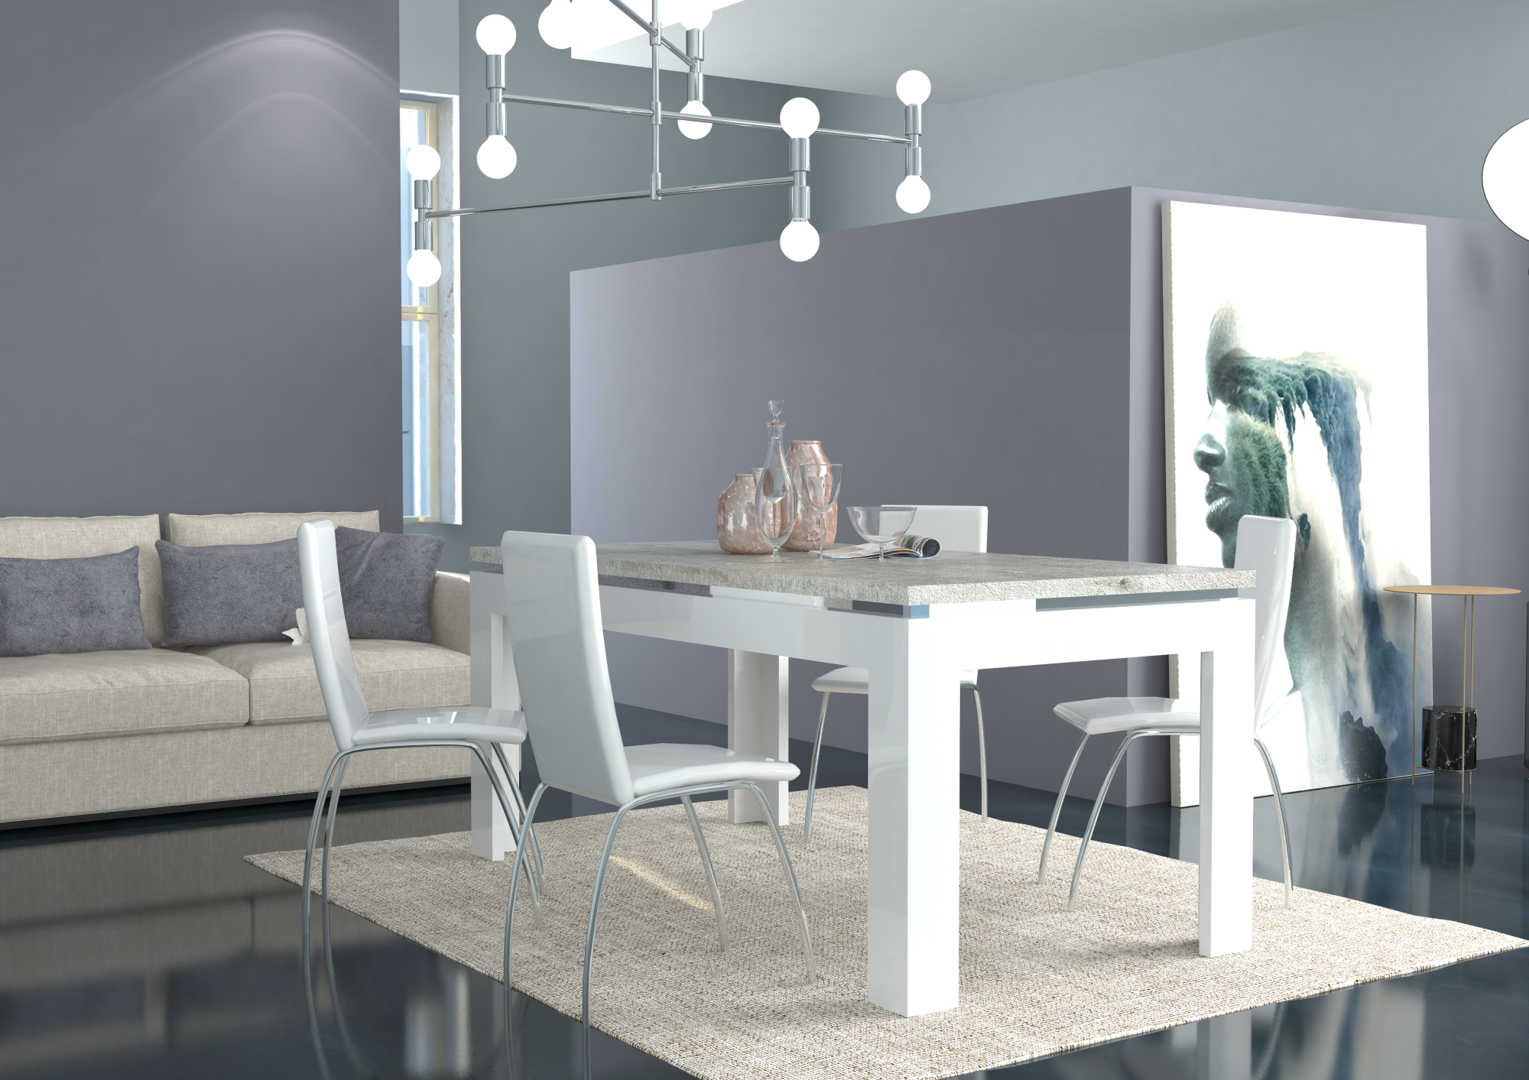 Tavolo moderno bianco messico mobile per sala da pranzo for Sala da pranzo versace